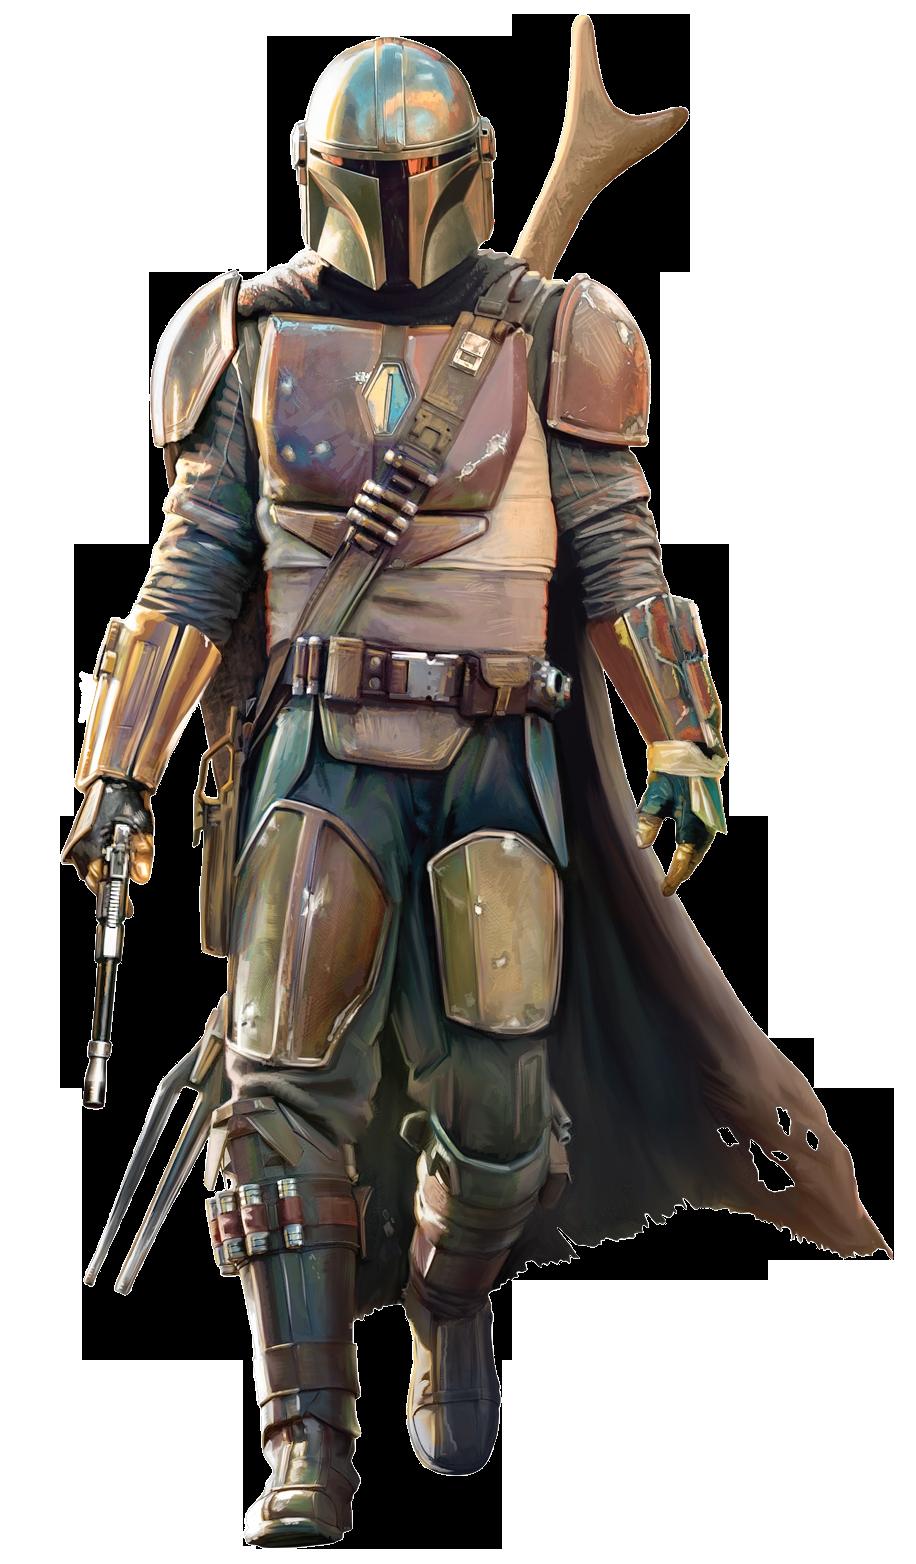 Mandalorian Armor Wookieepedia Fandom